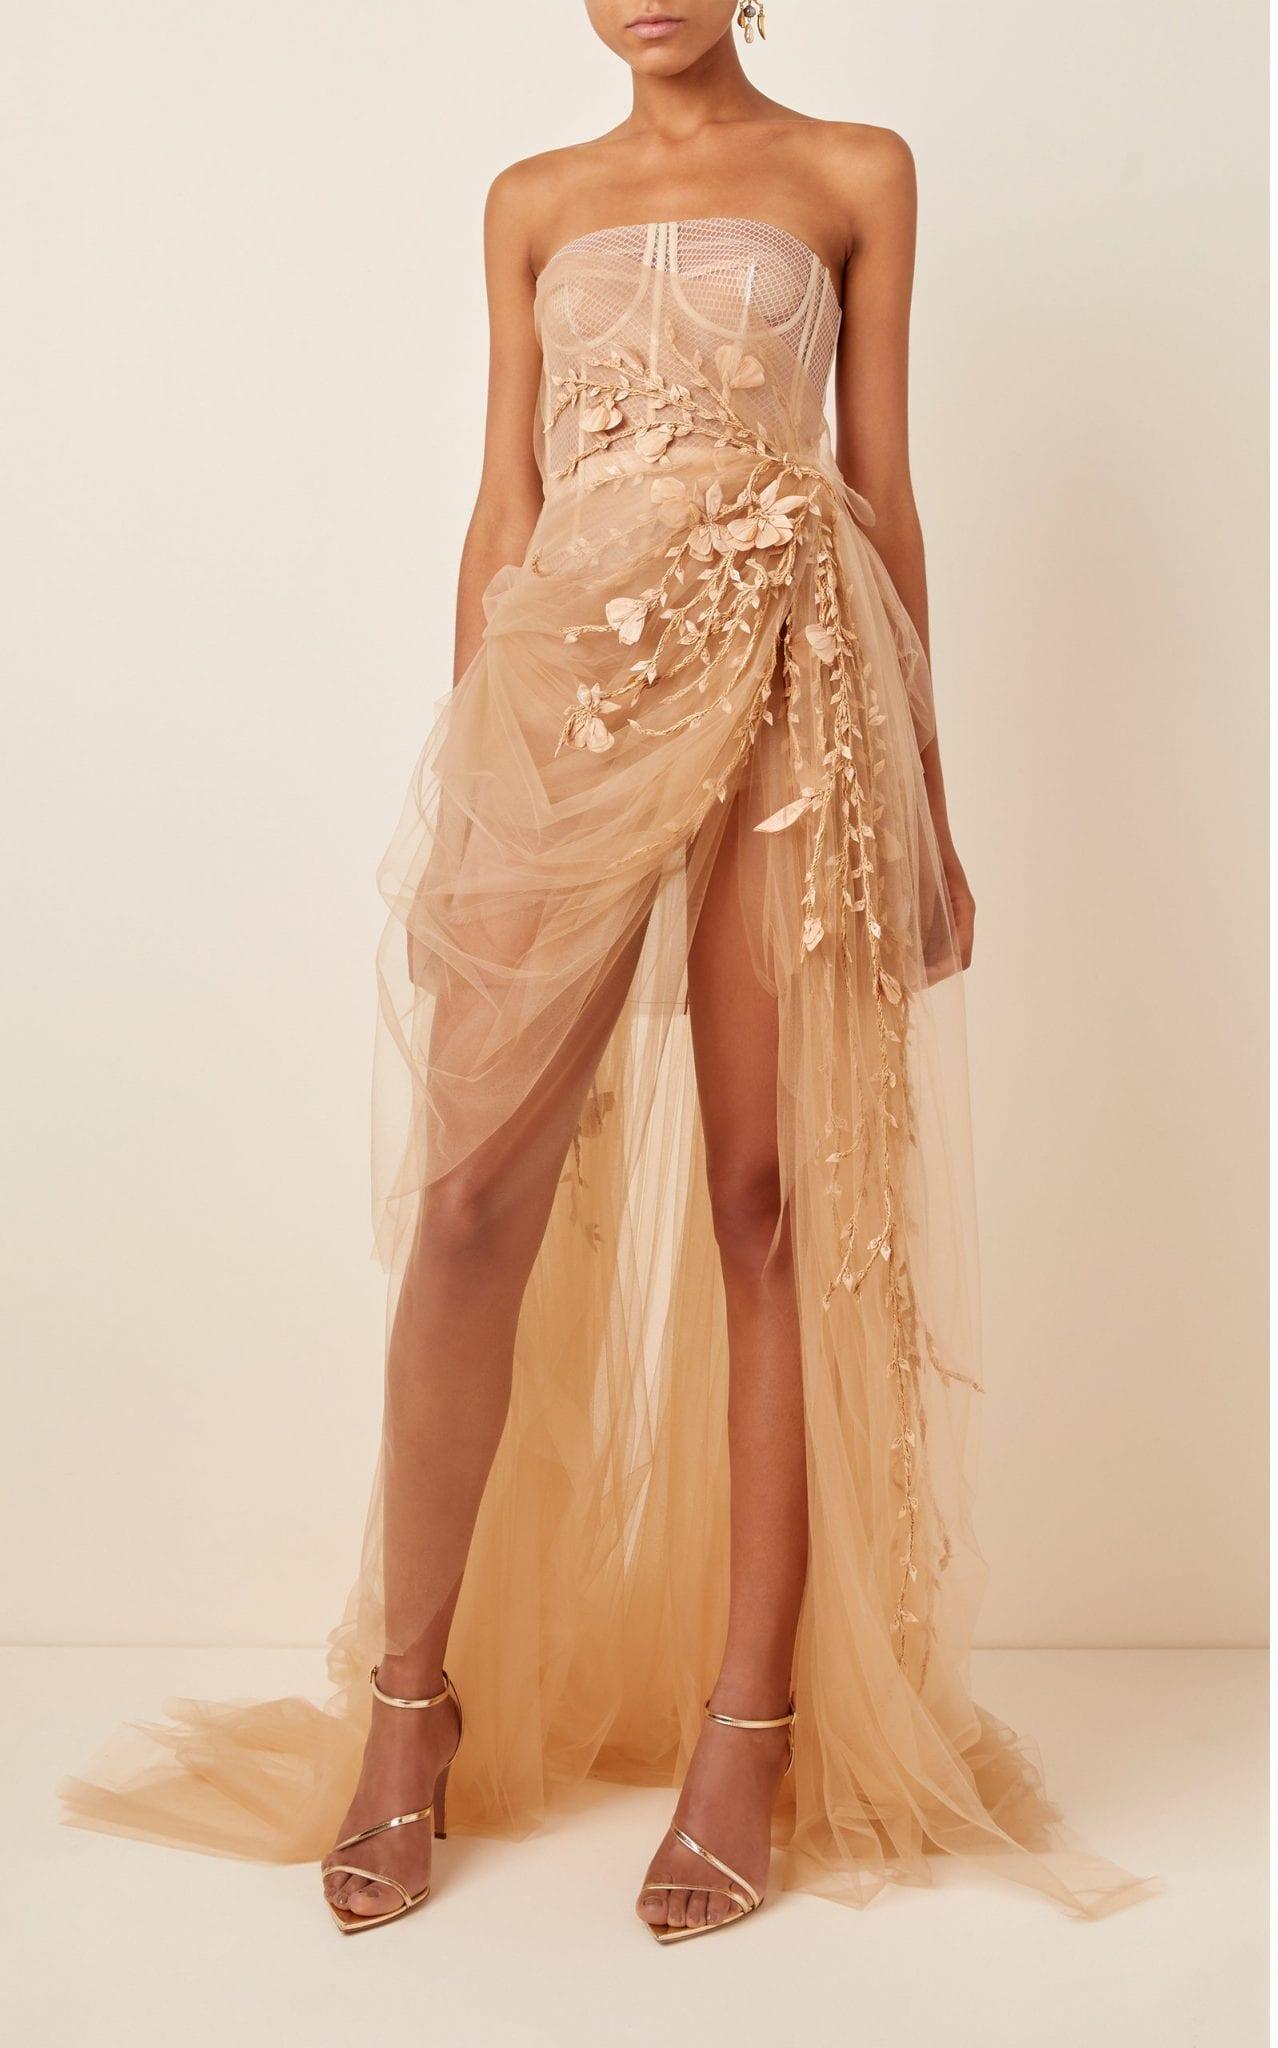 OSCAR DE LA RENTA Embroidered Tulle Bustier Gown